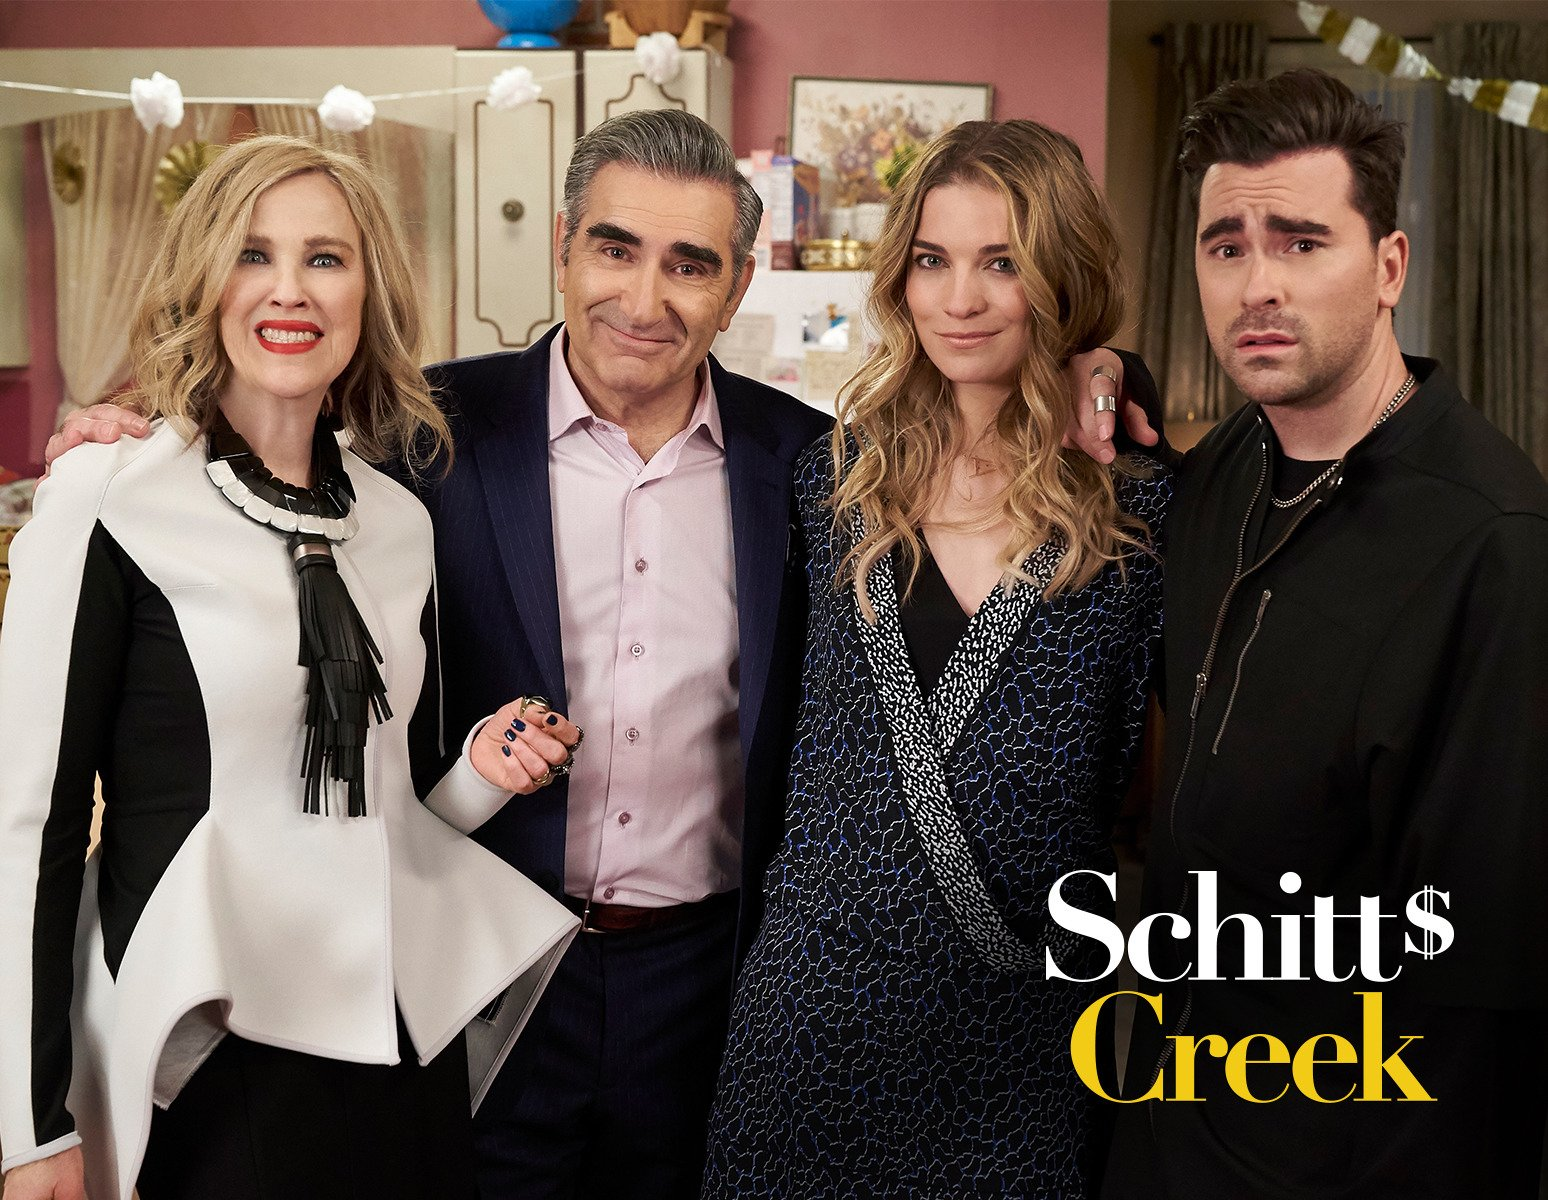 schitts creek season 4 episode 3 online free